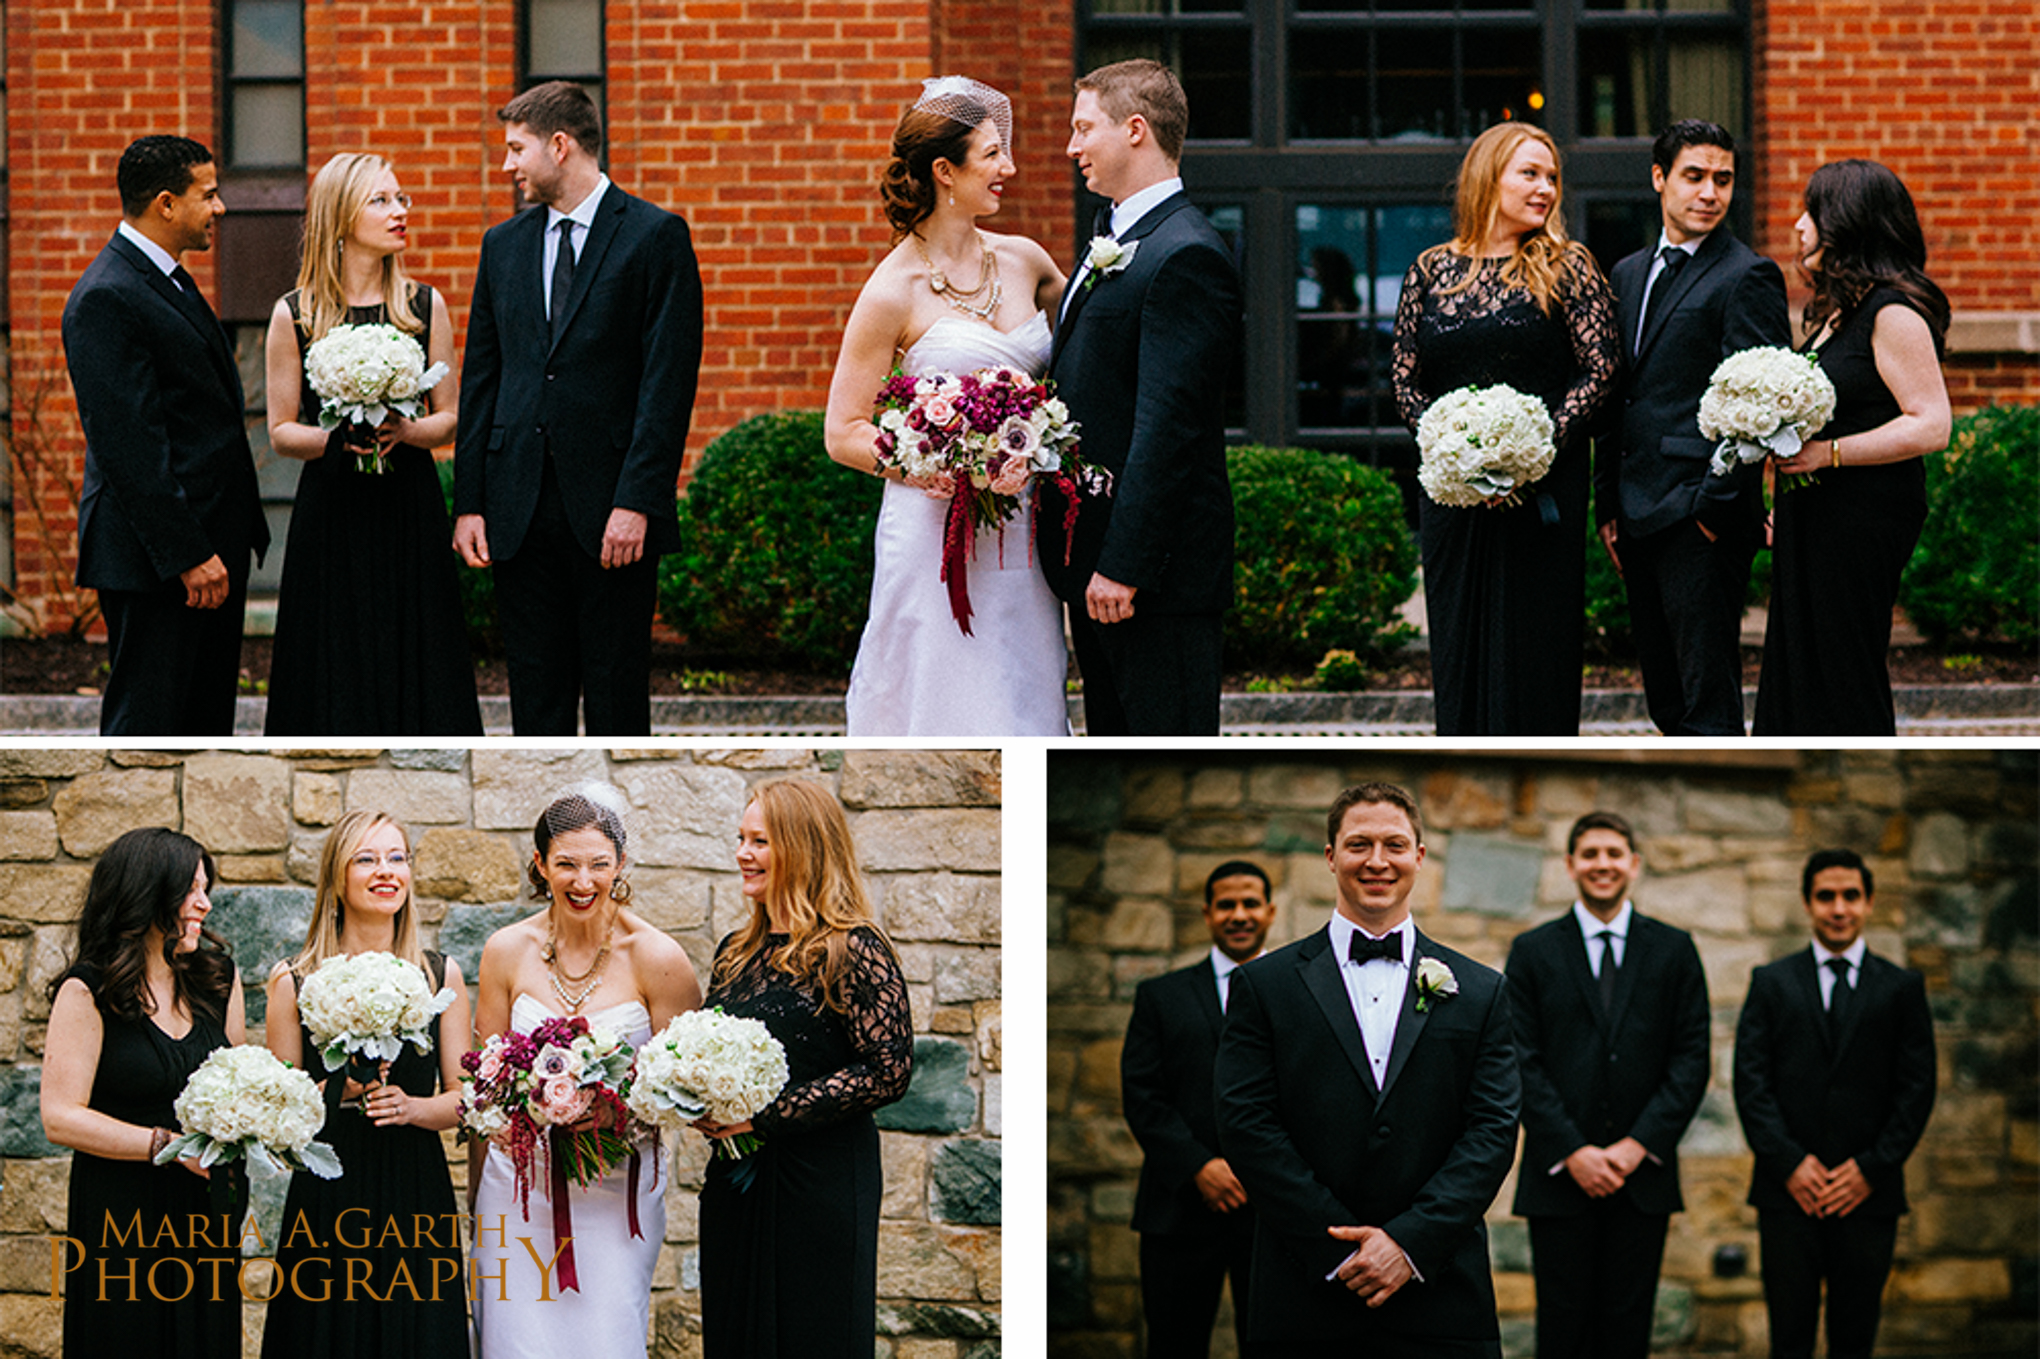 Georgetown Weddings, DC Wedding Photography, Weddings at the Ritz in DC_015.jpg